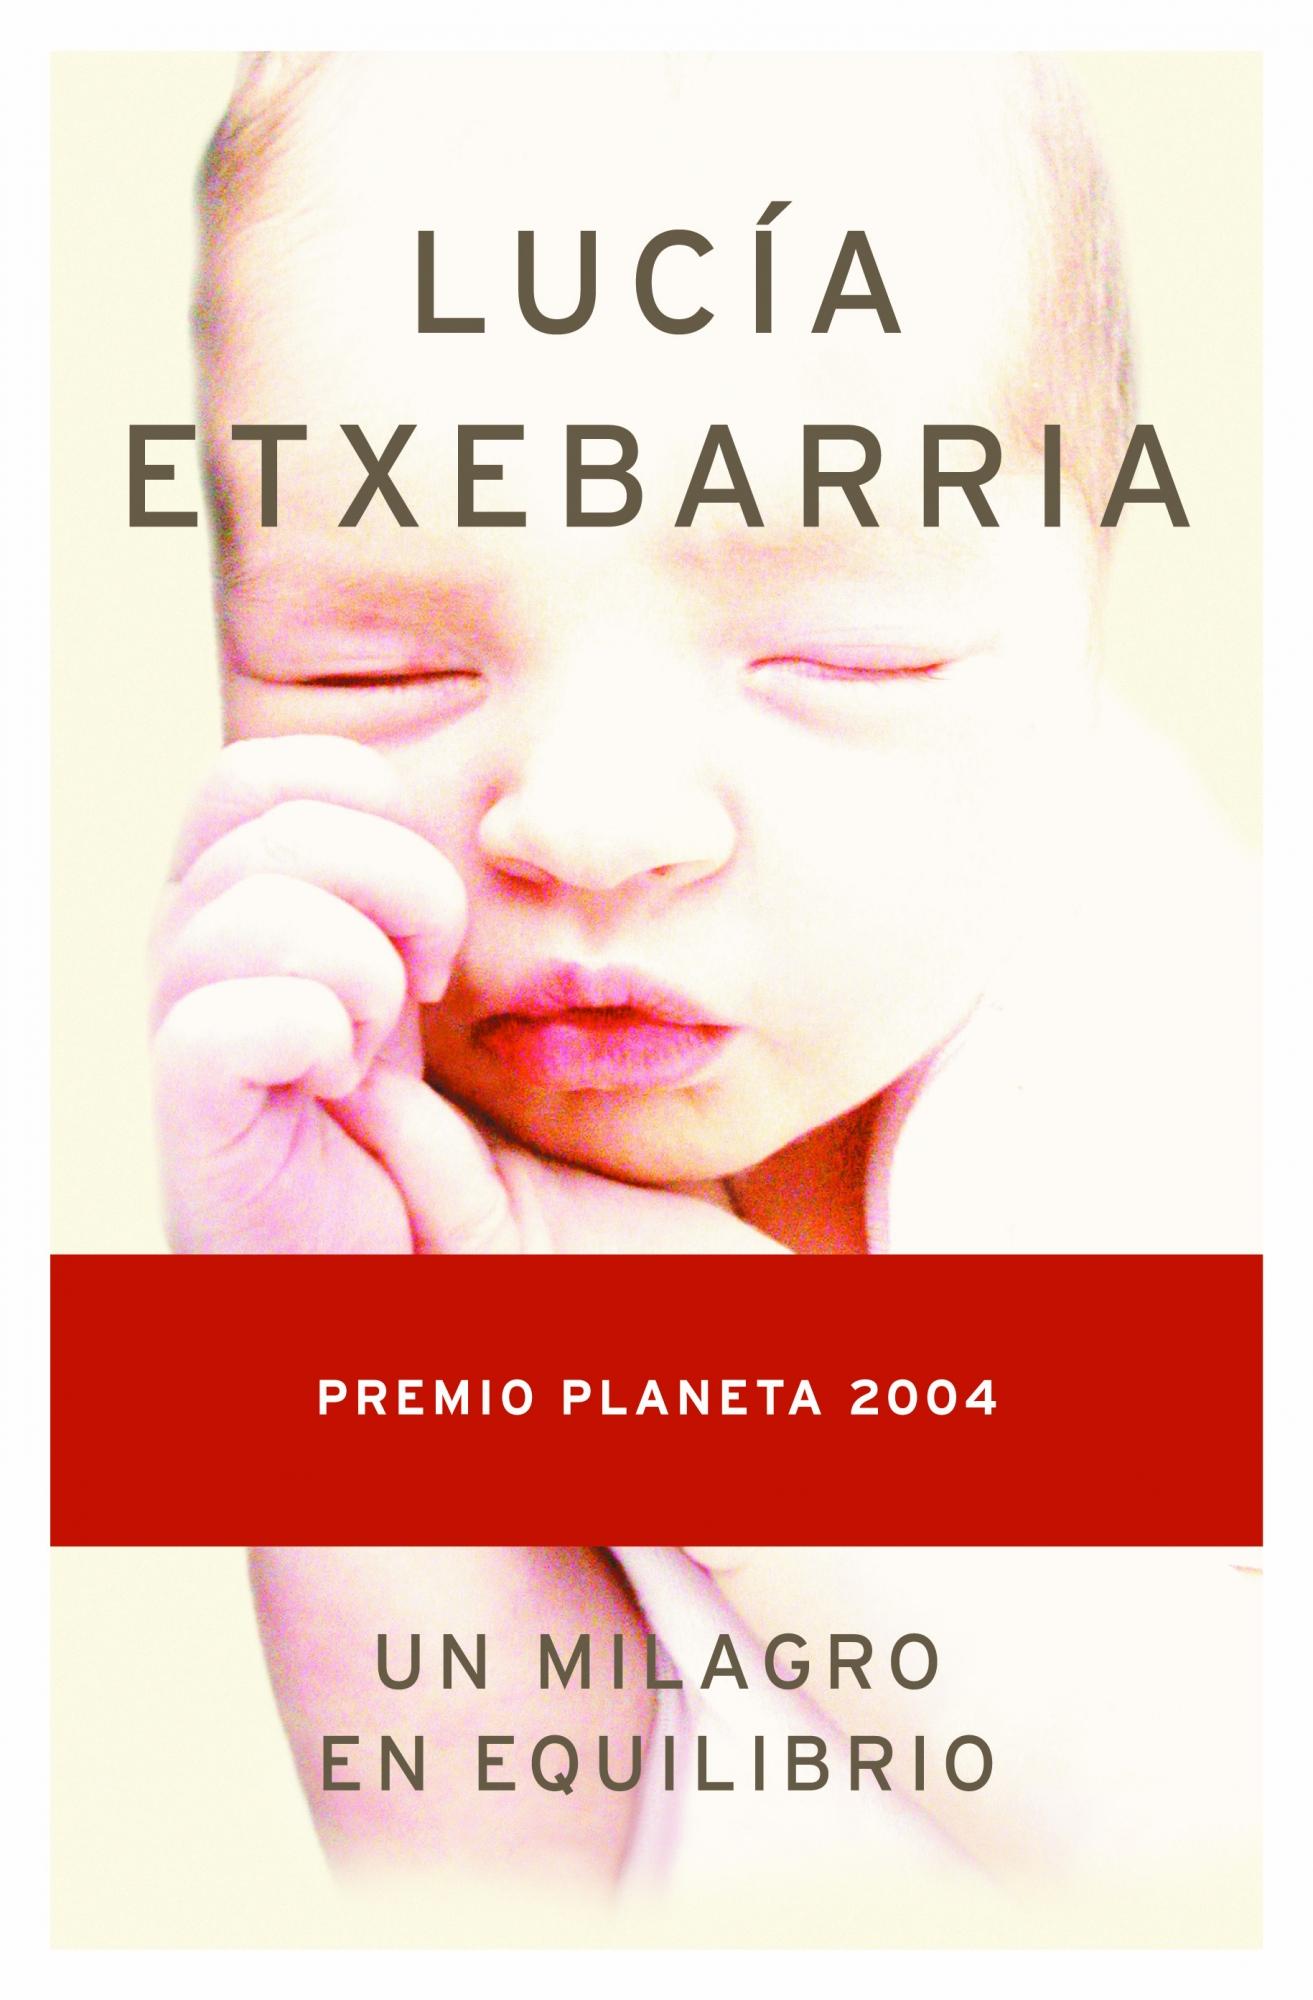 Lucia etxebarria 9